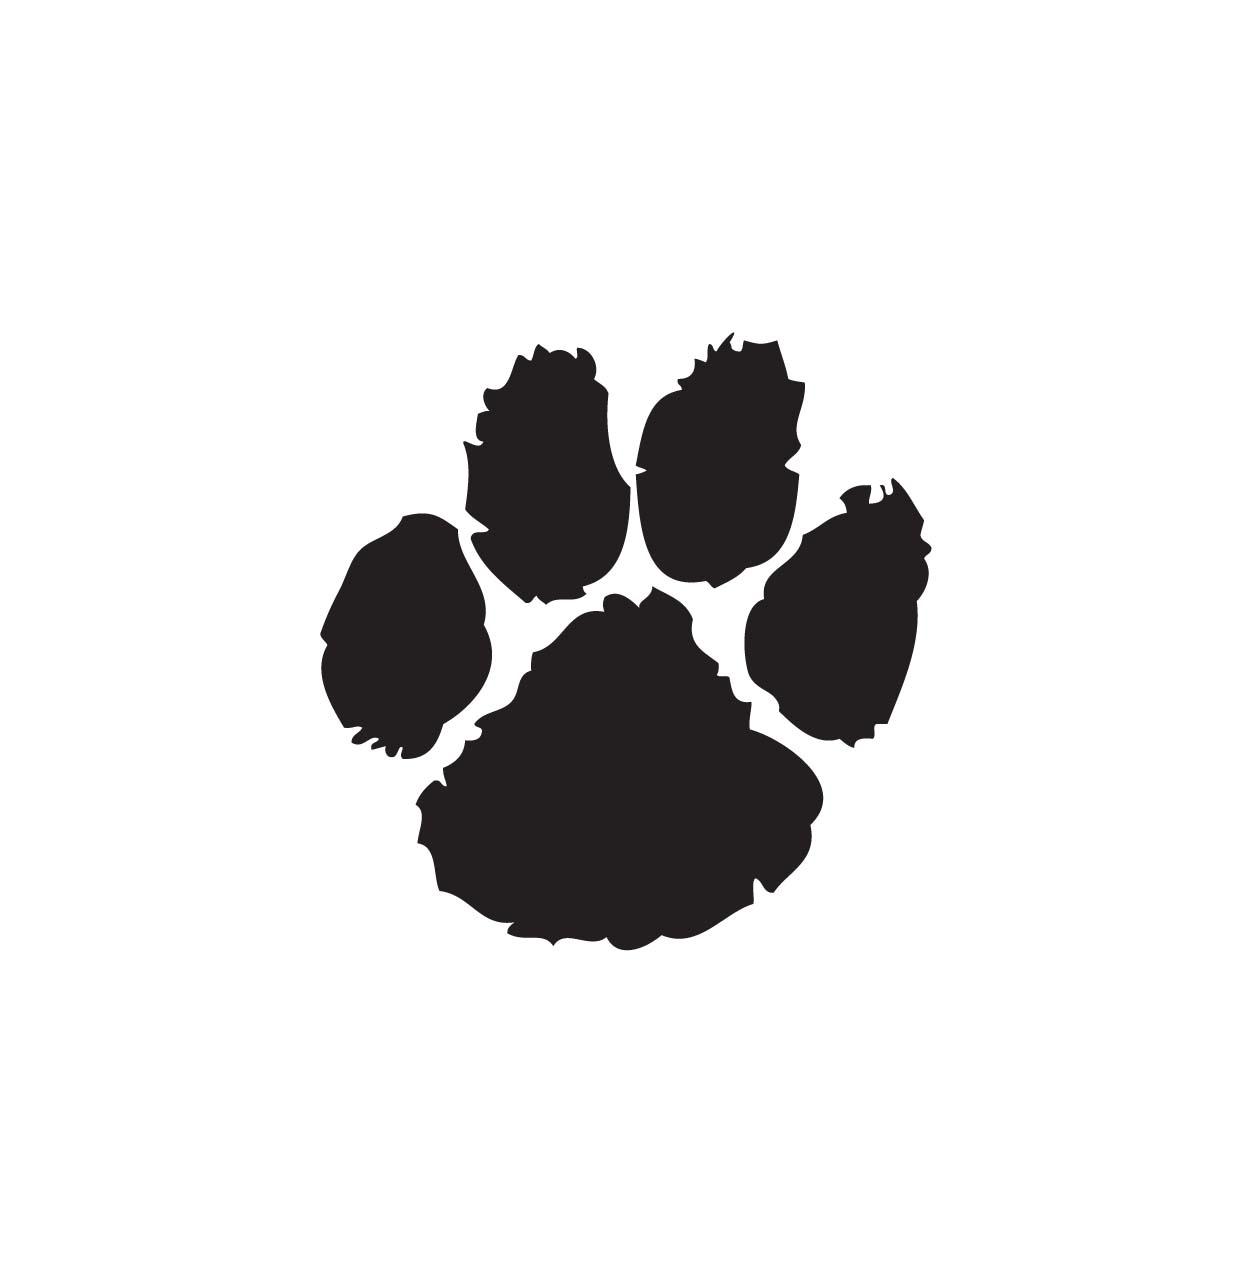 Dog Paw Print Image | Free download best Dog Paw Print Image on ...